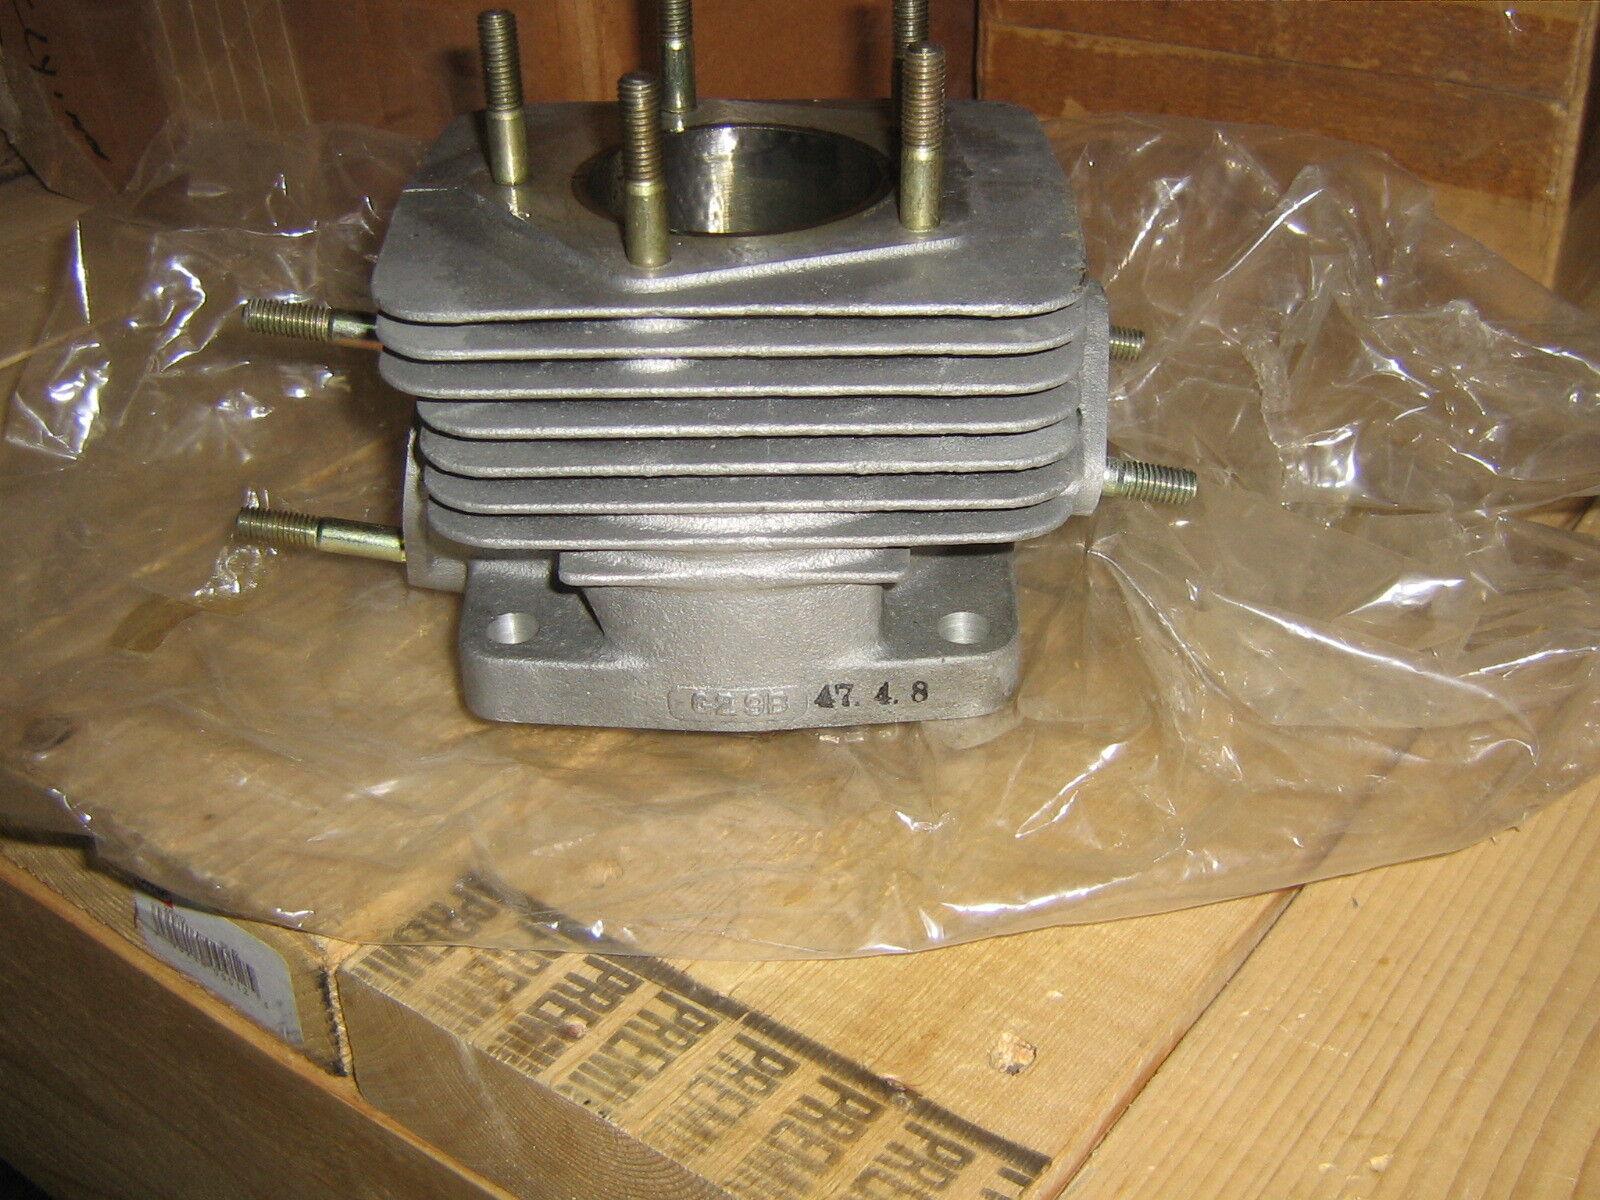 Chaparral xenoah g29b 292cc cylinders nos  59.5mm bore1973-74 firebird x 2